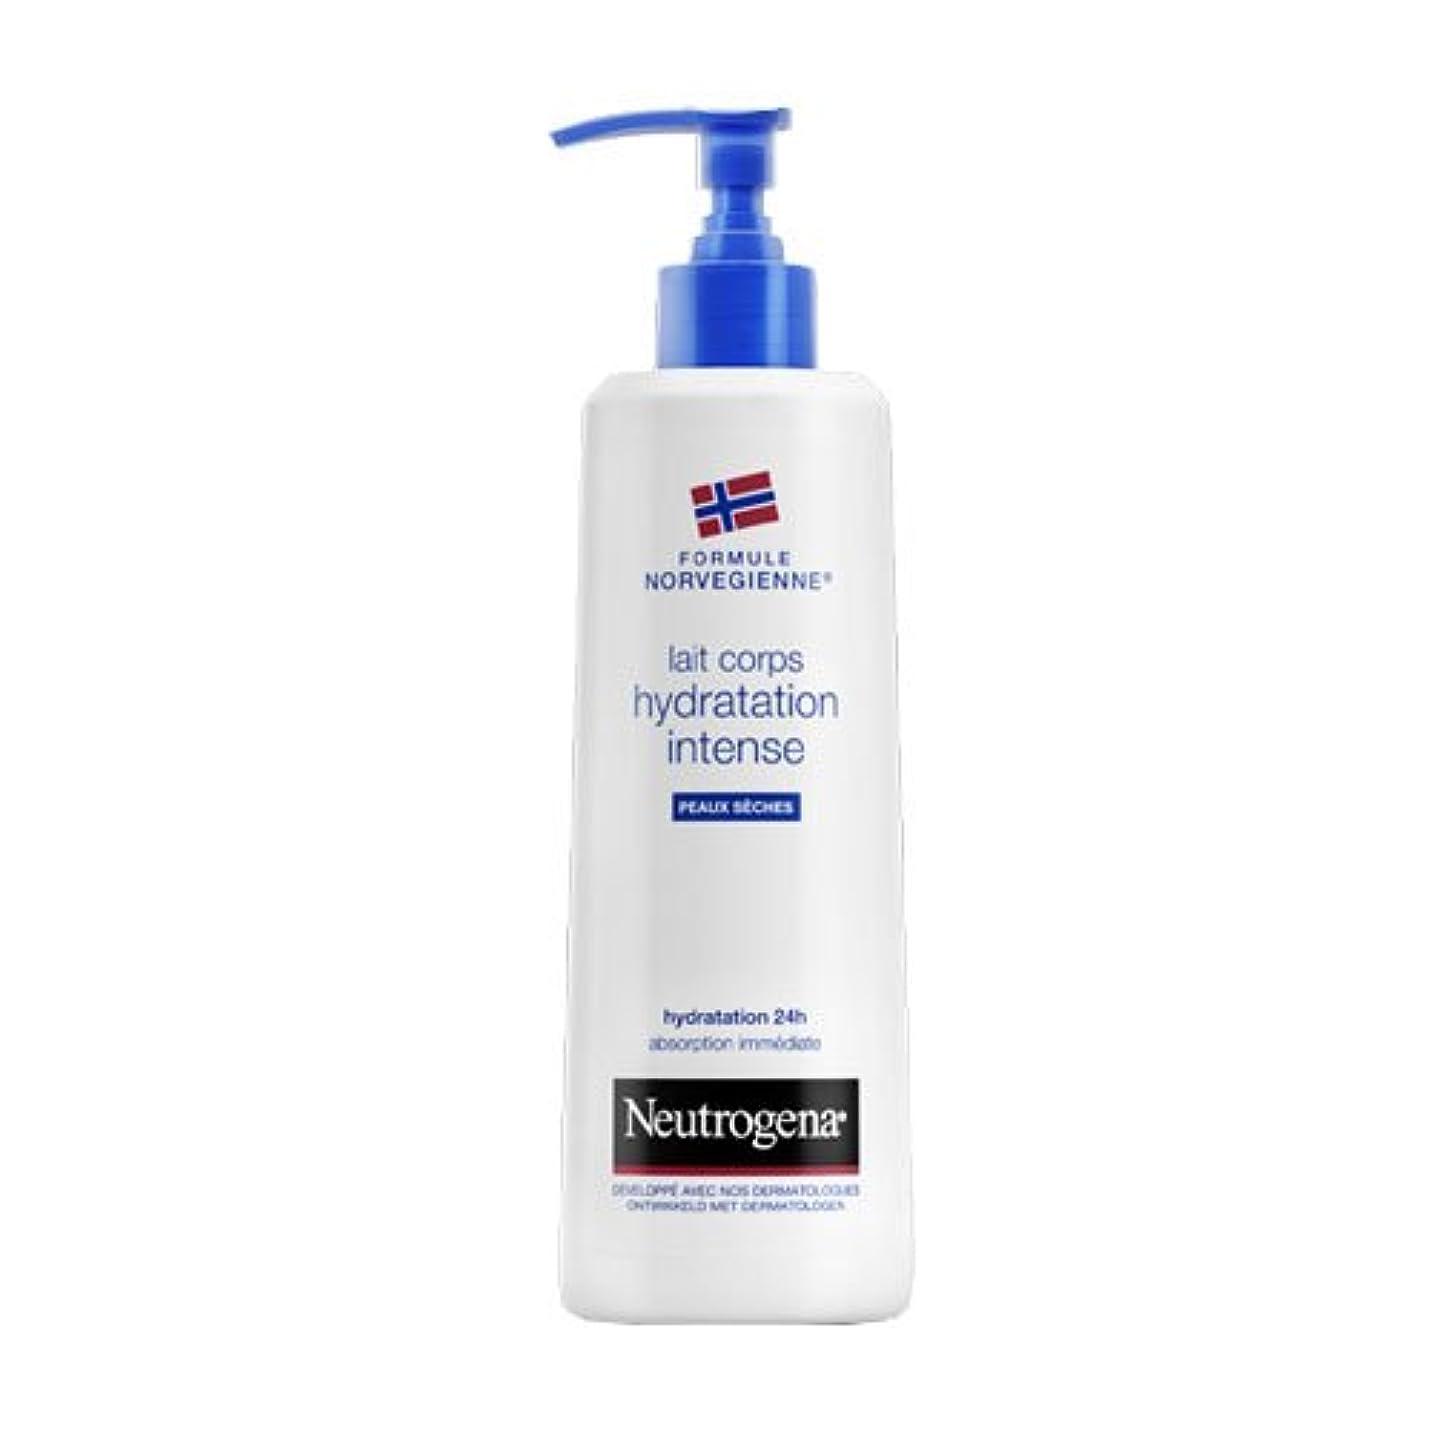 不調和人工的な指Neutrogena Body Lotion Dry Skin 750ml [並行輸入品]